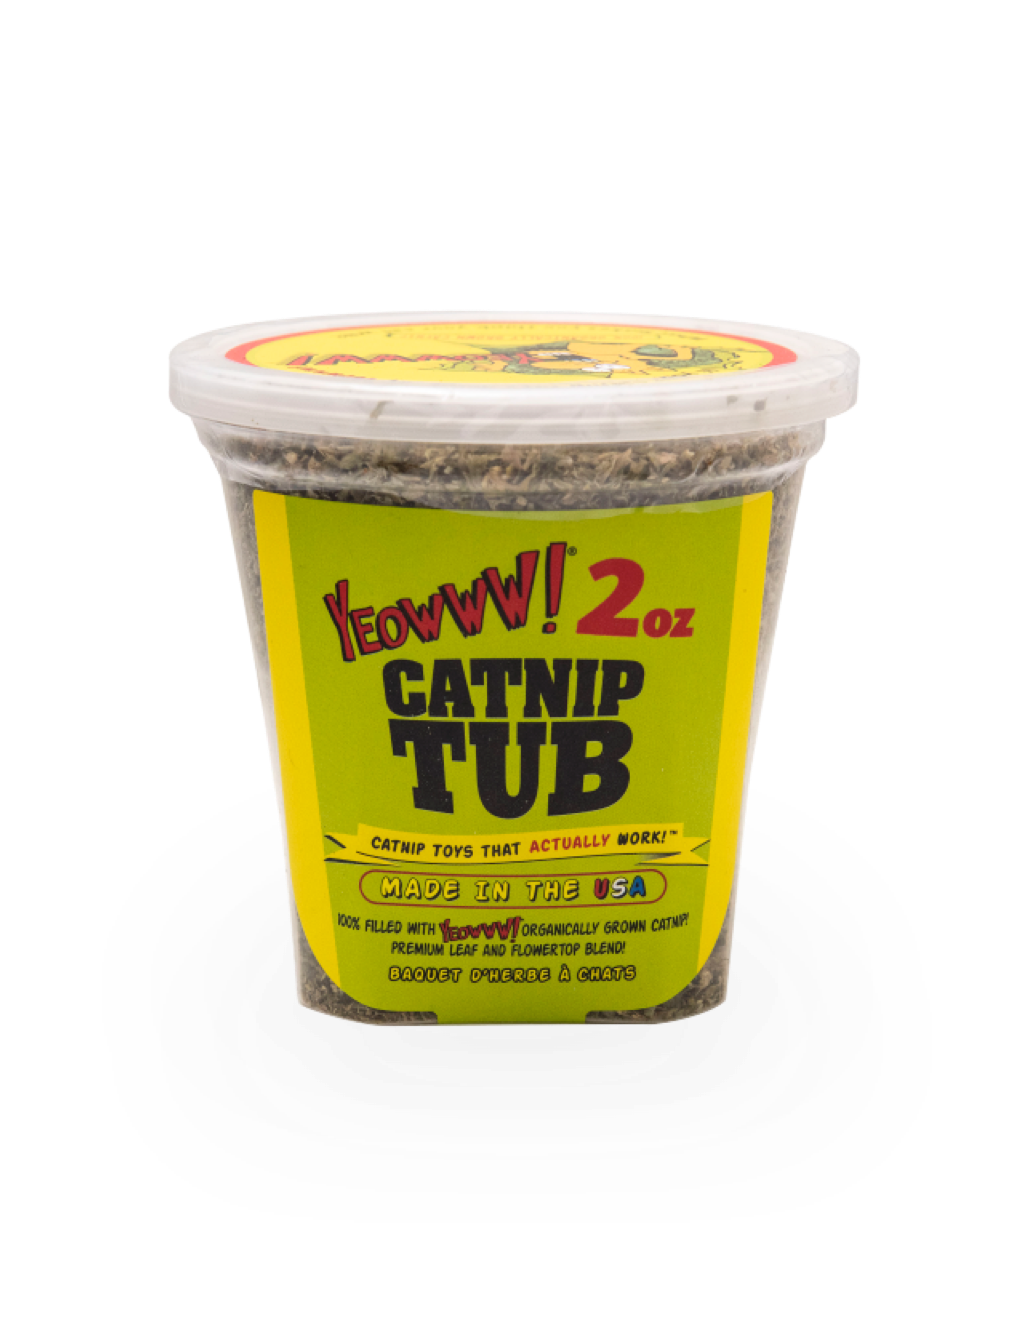 Catnip Tub, 2 oz.